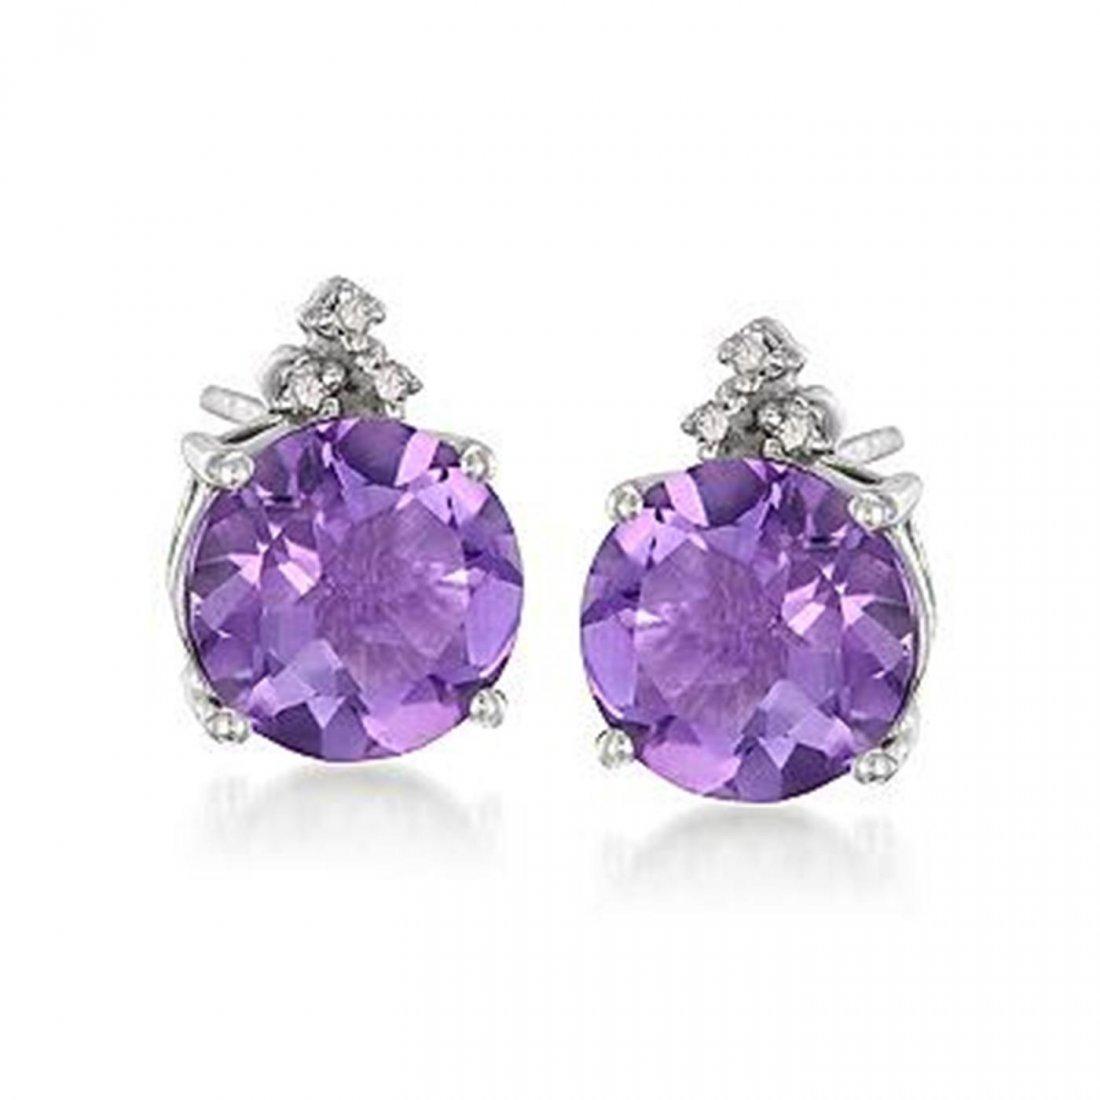 13R: 3.60 ct. t.w. Purple Amethyst and .10 ct. t.w. Dia